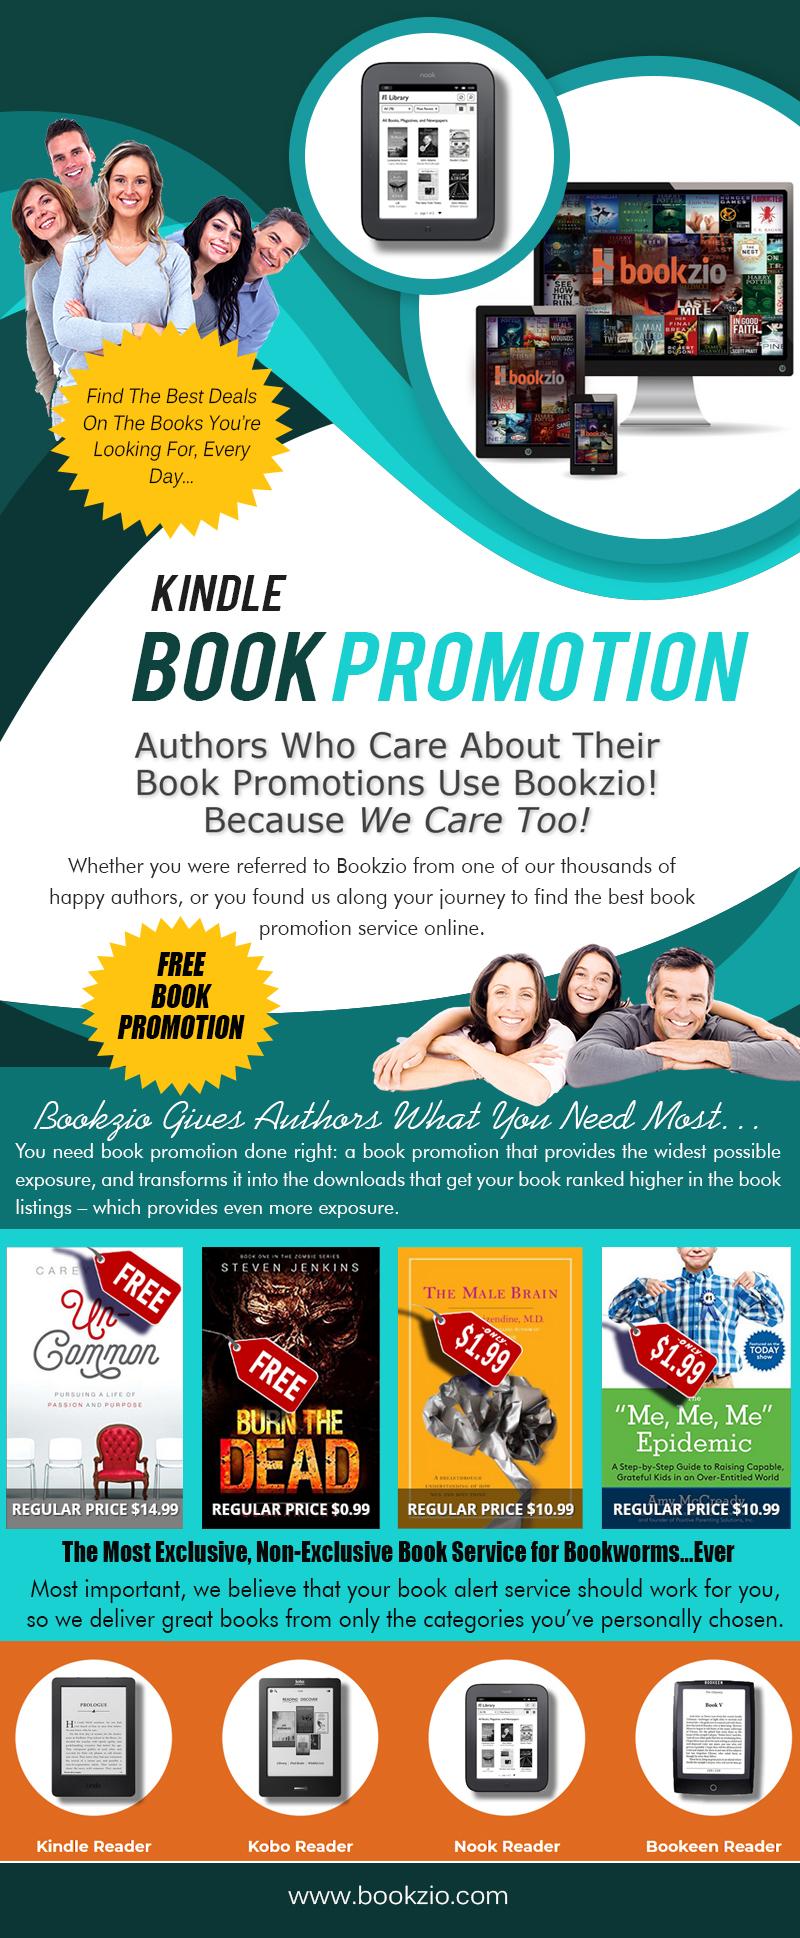 Free Book Promotion - ImgPaste net